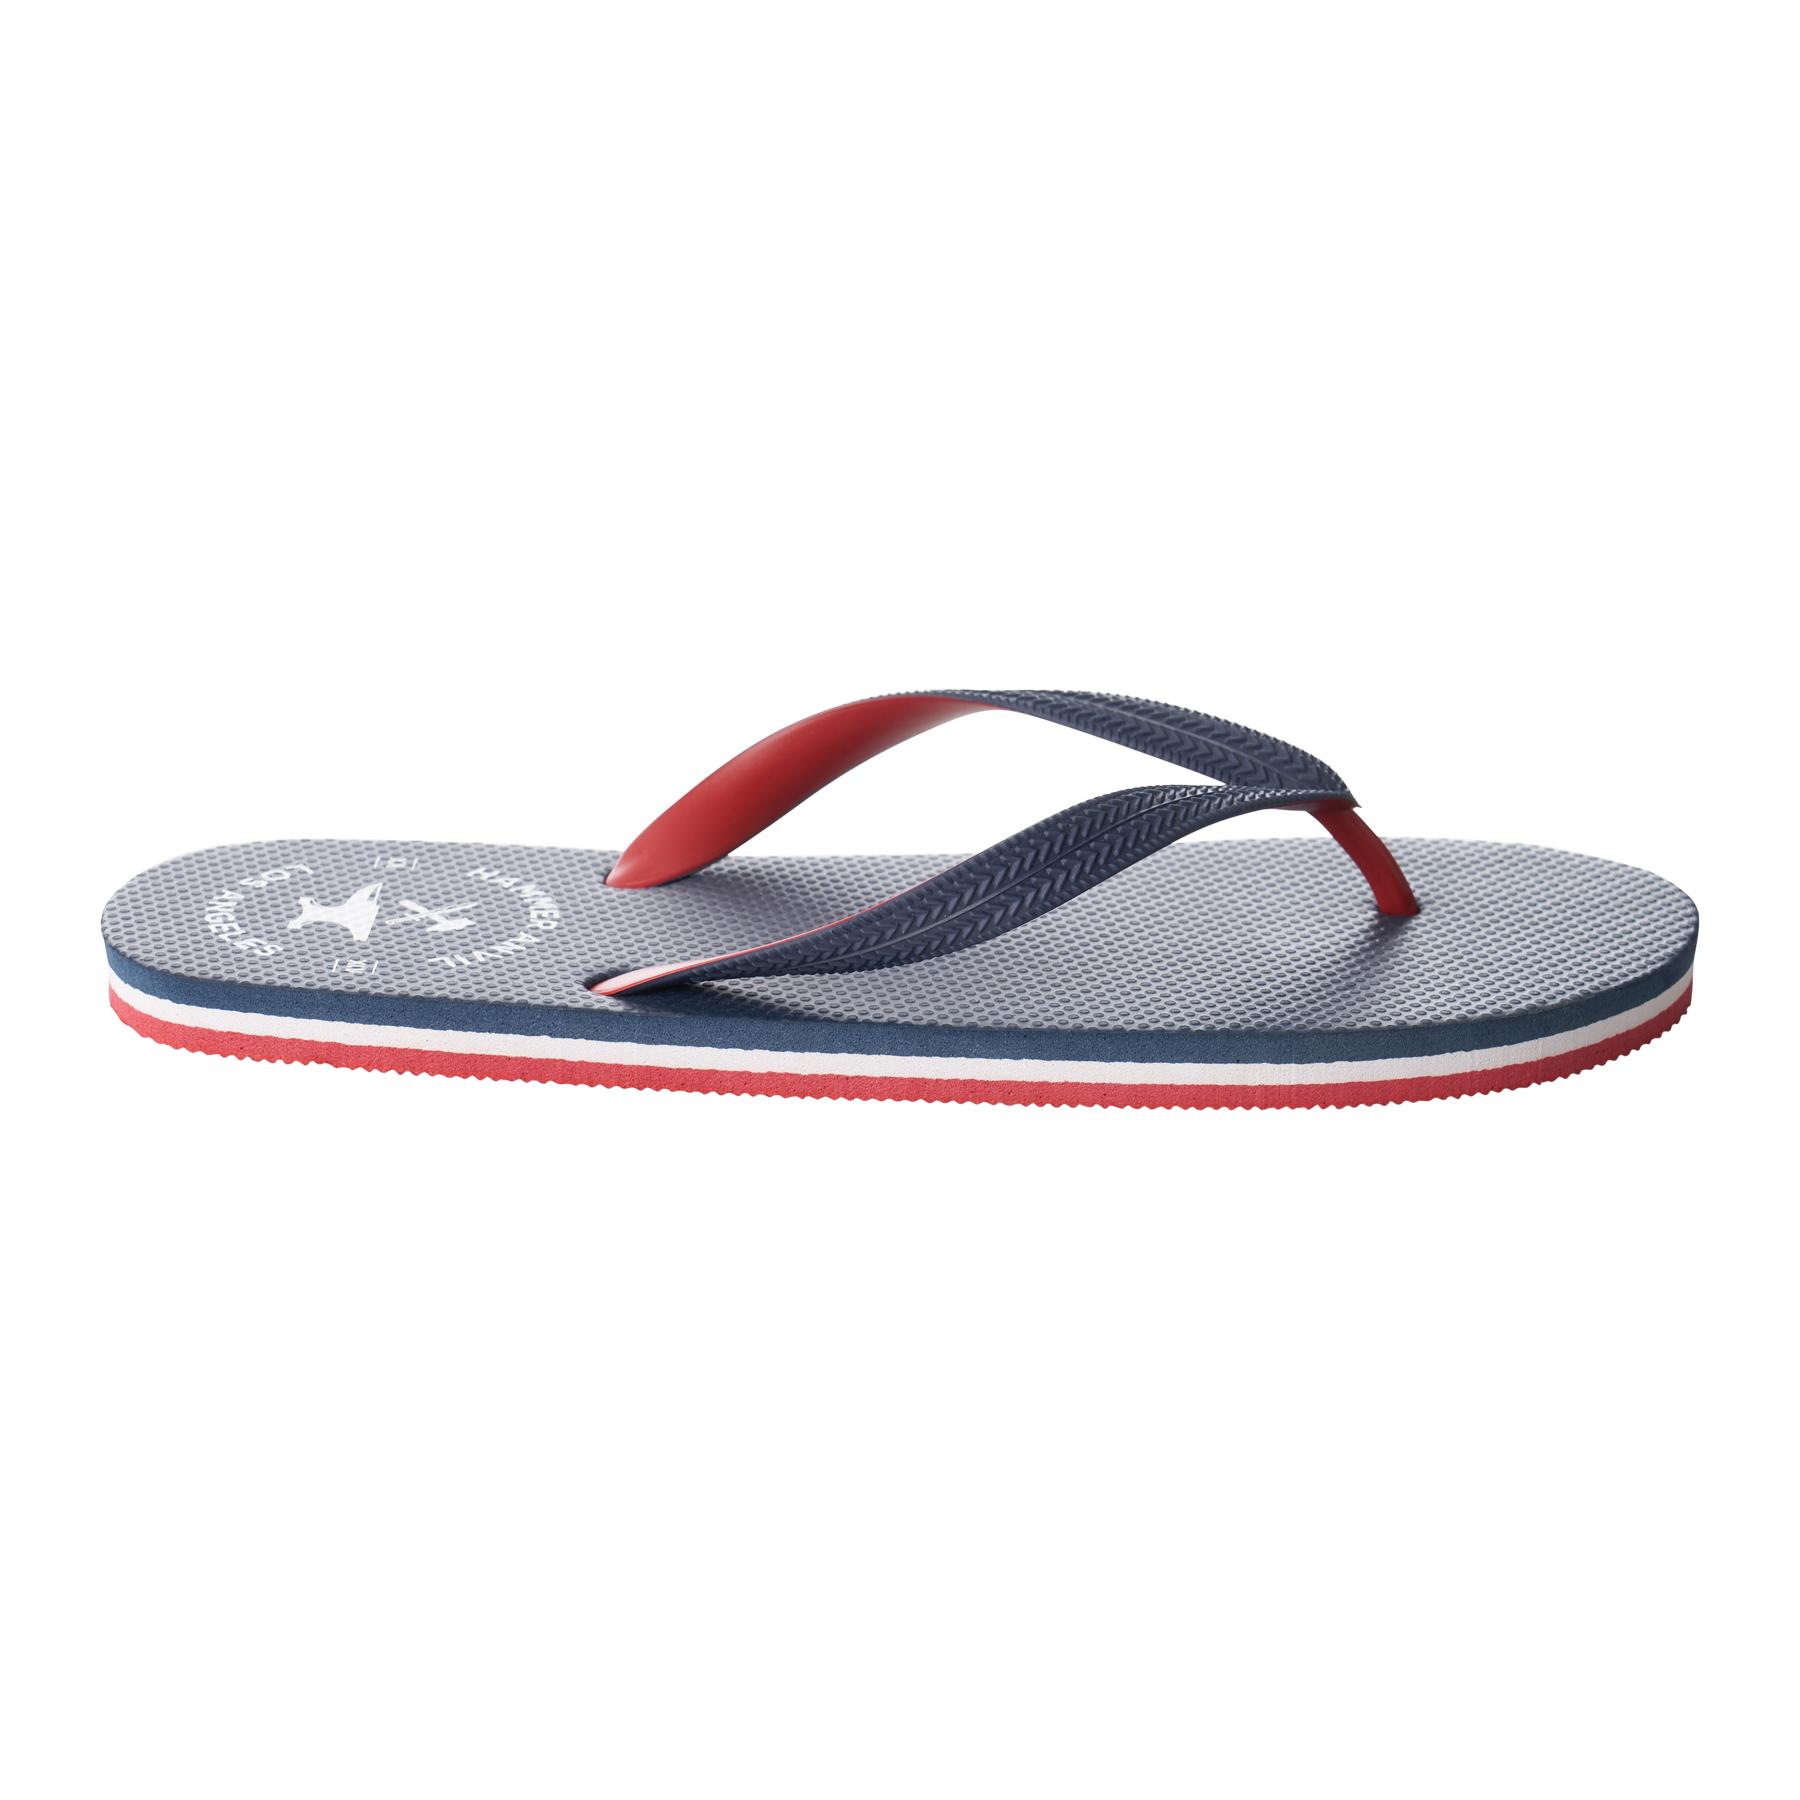 Hammer-Anvil-Mens-Flip-Flops-Casual-Thong-Summer-Sandals-Comfortable-Beach-Shoes thumbnail 21